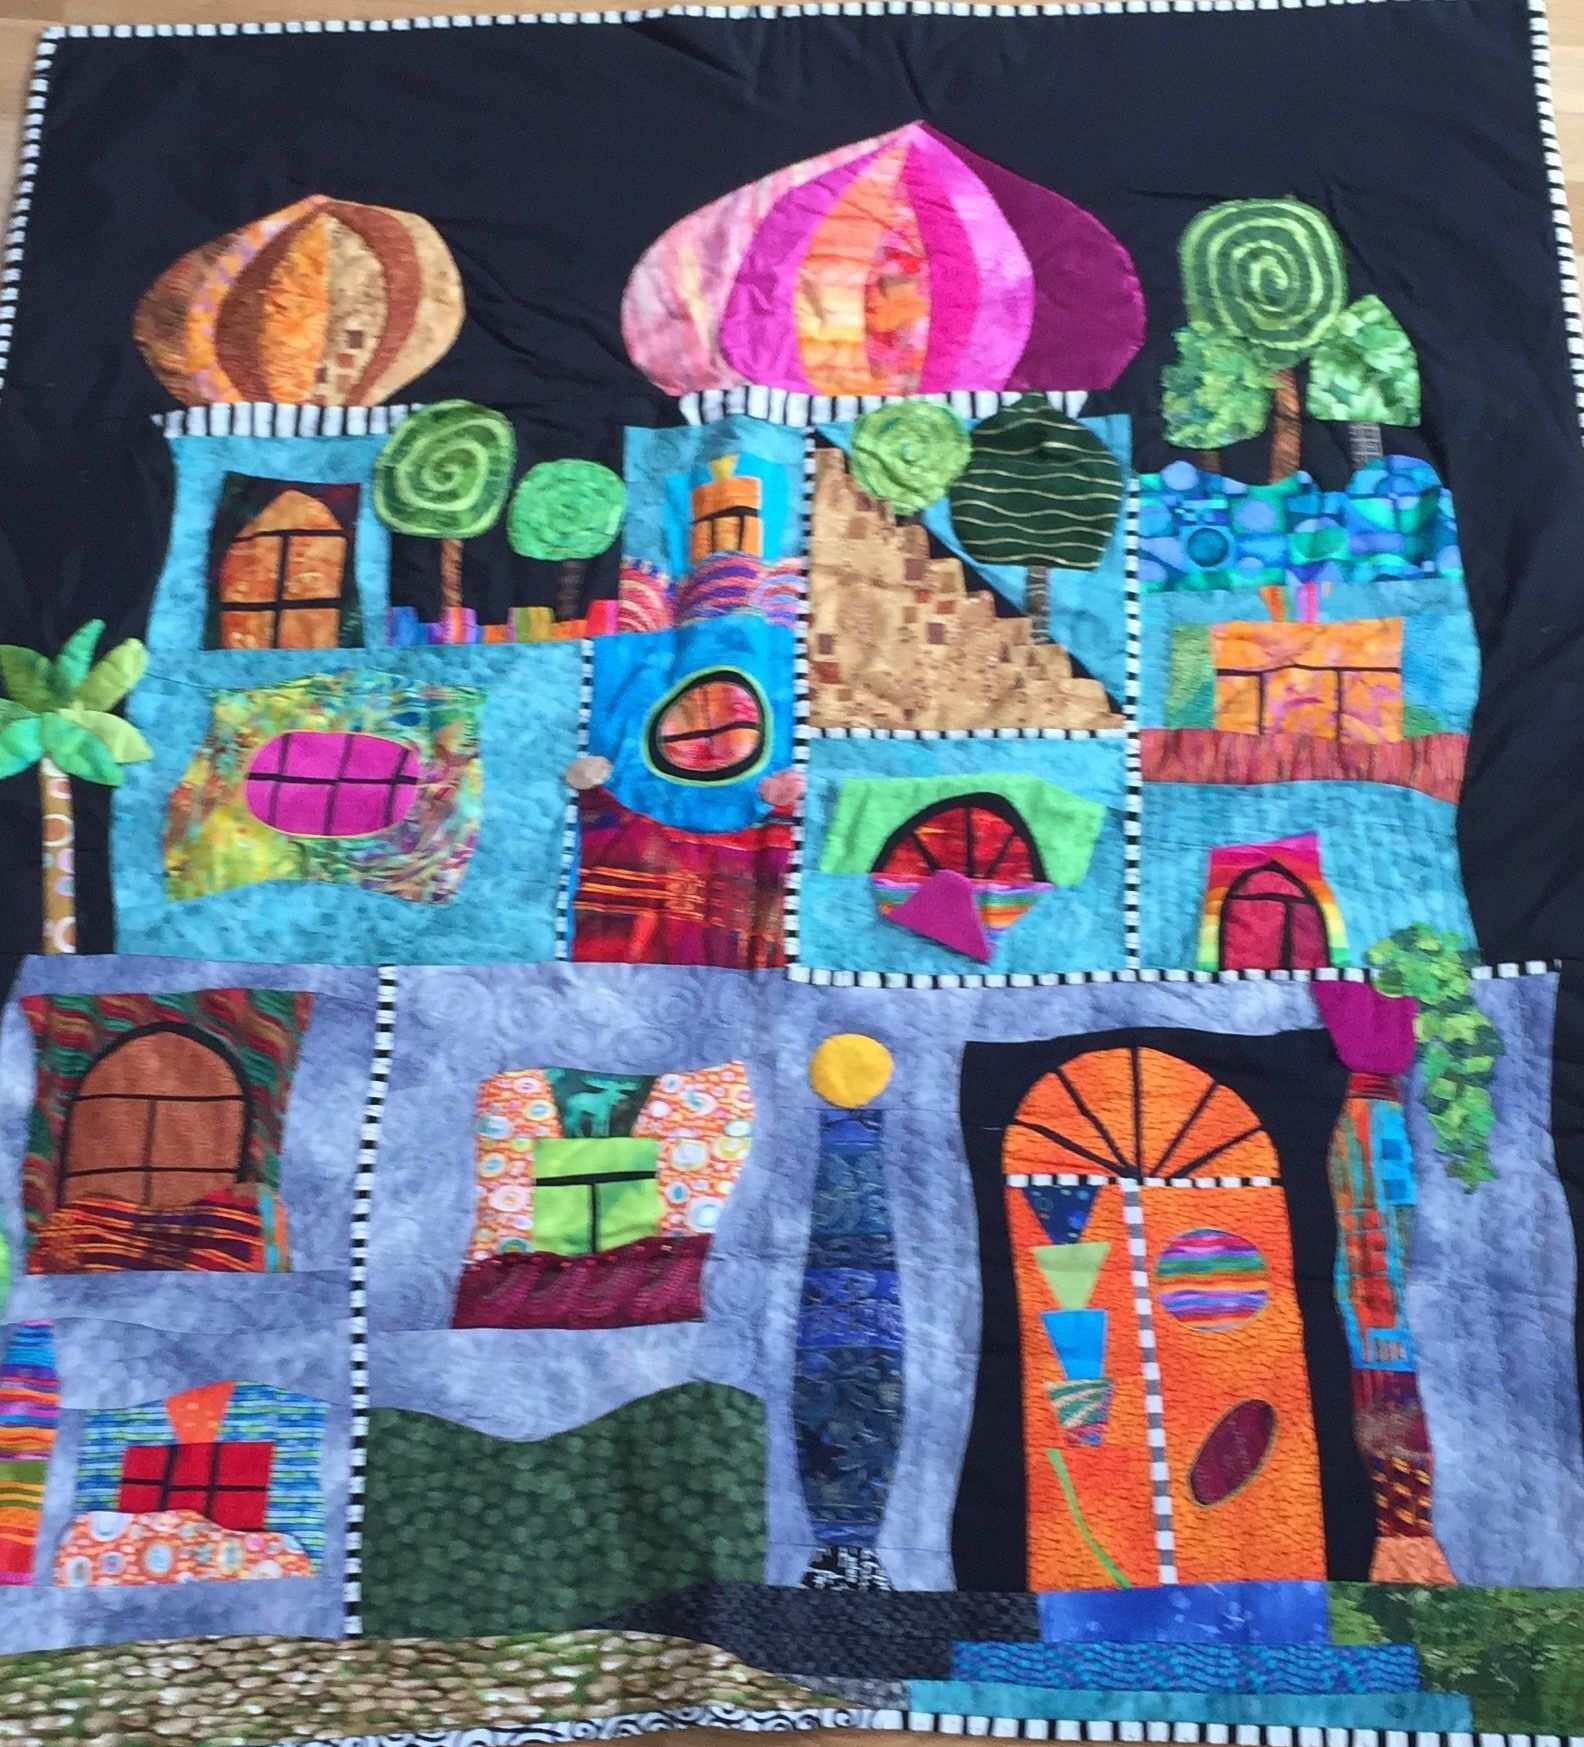 Hundertwasser Quilt Hundertwasser Kunsttagebuch Kunst